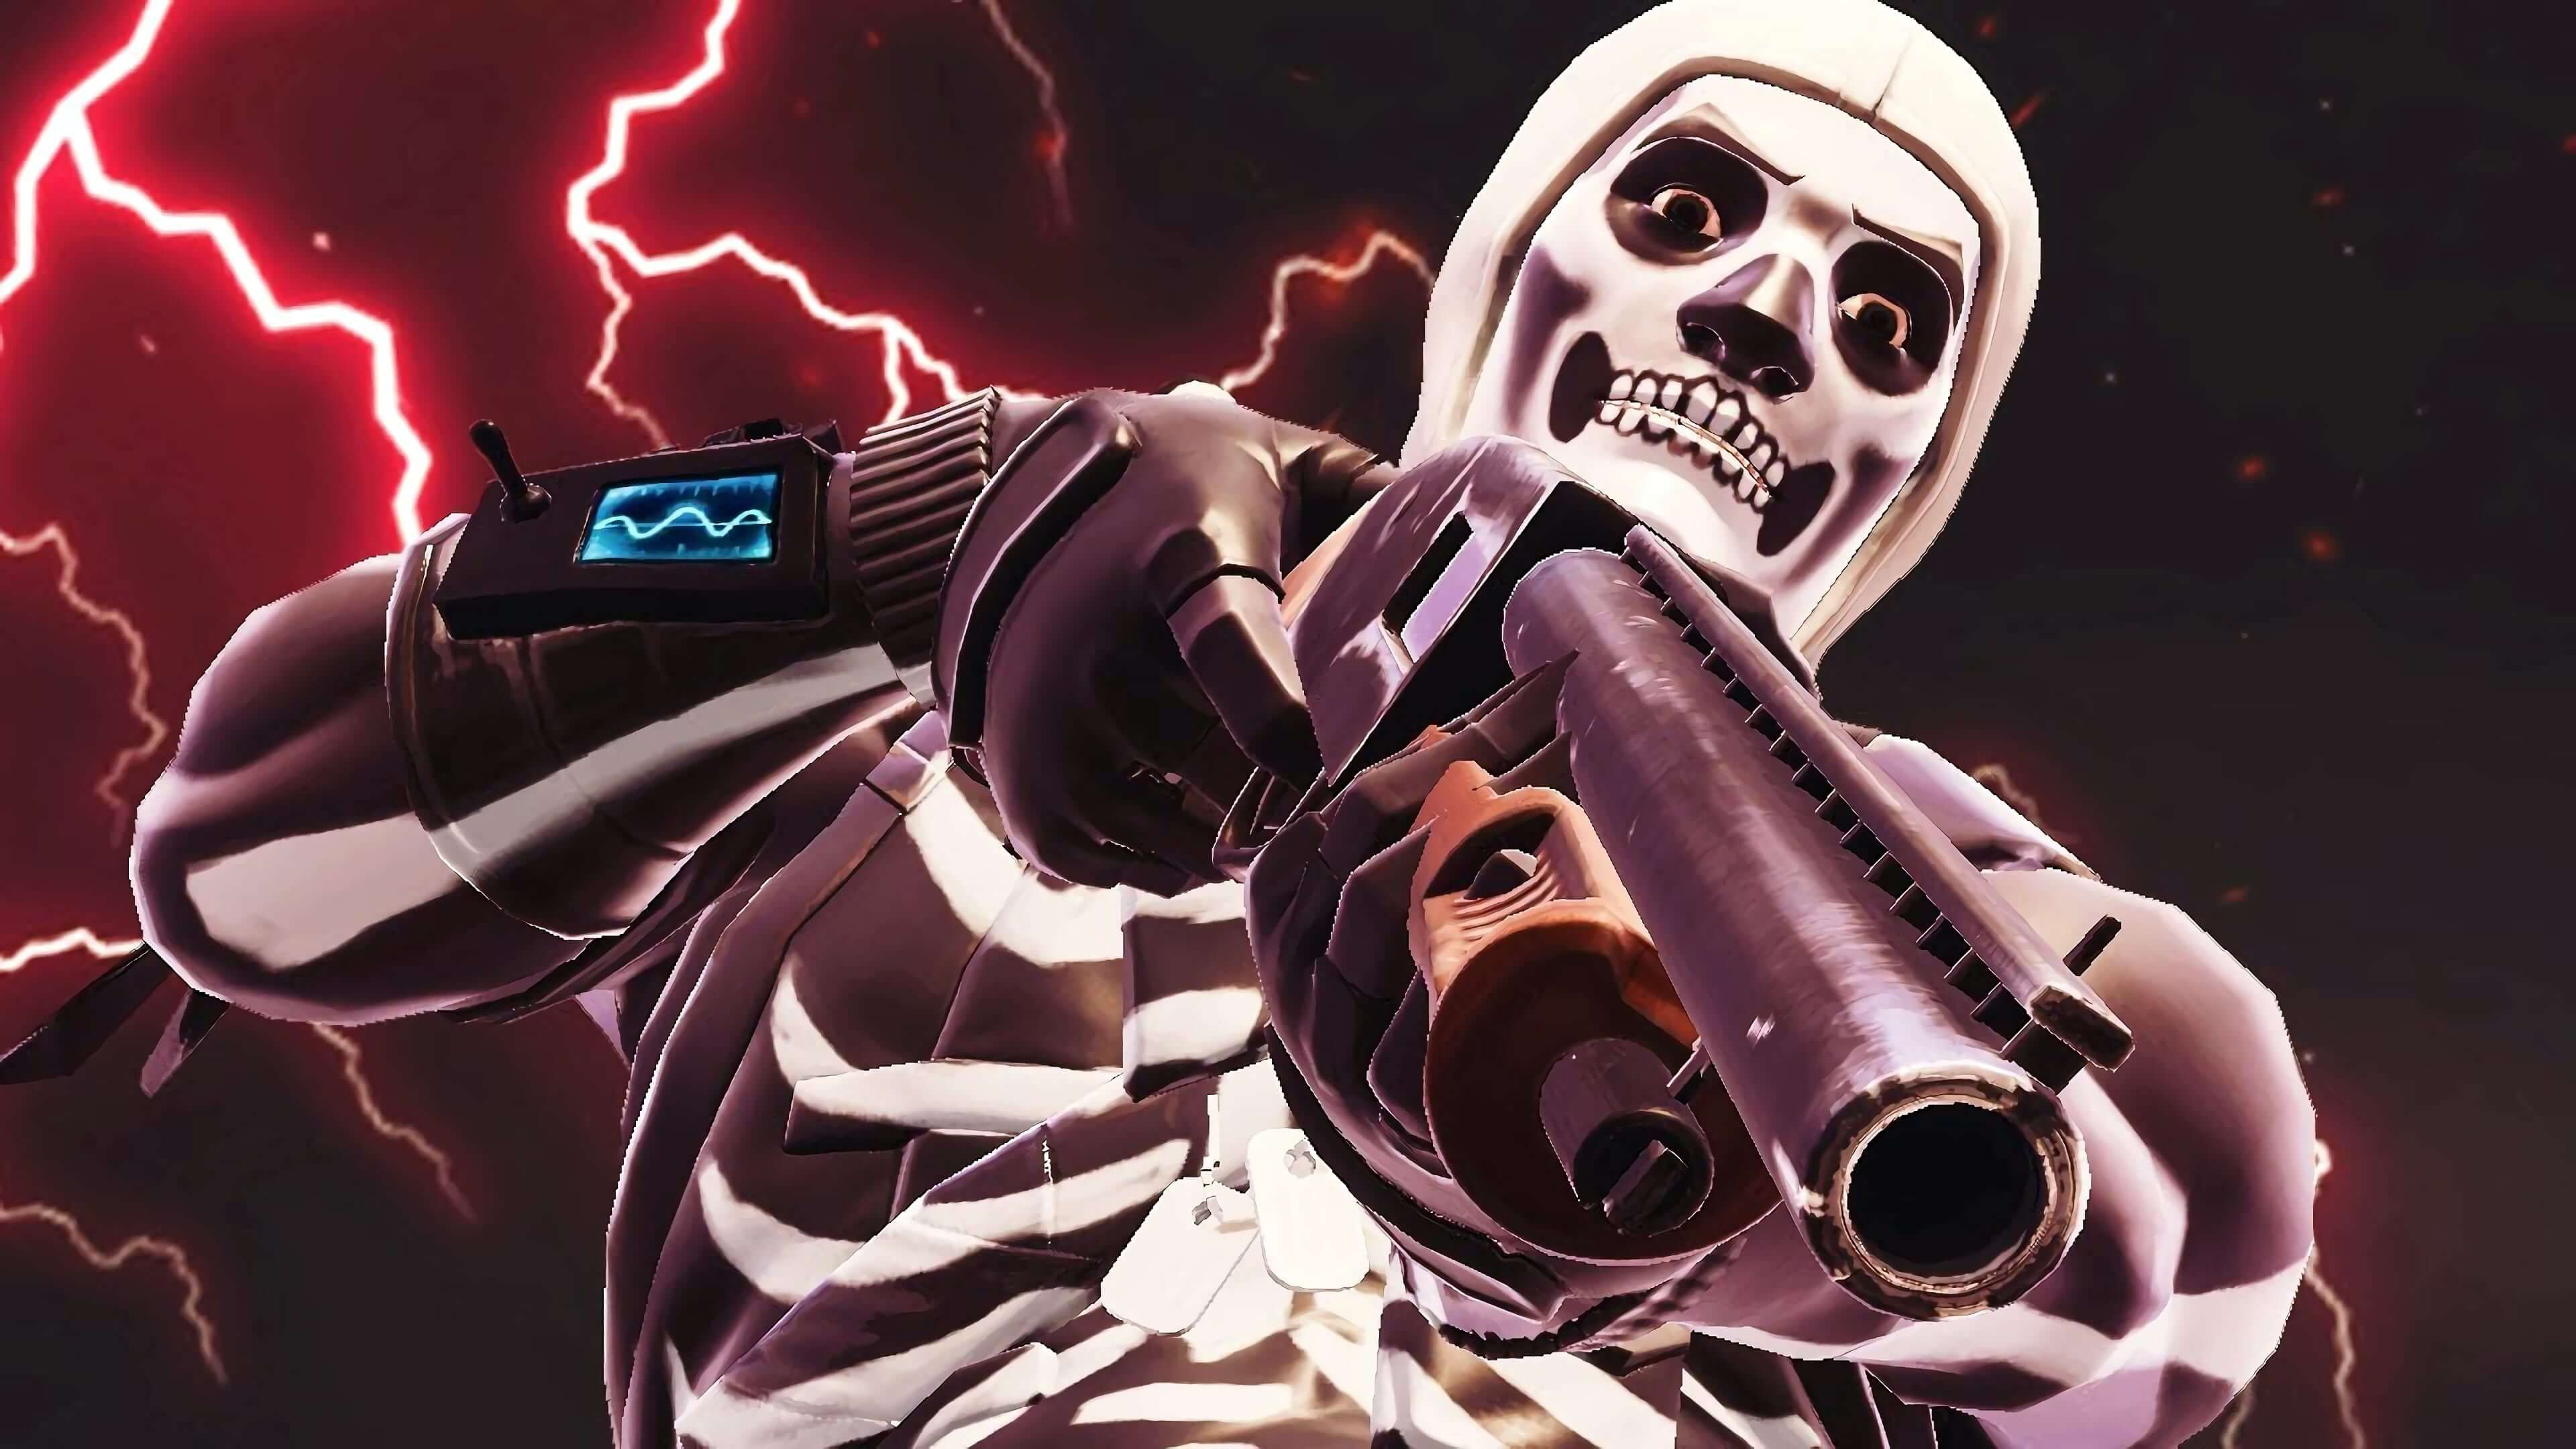 Https Www Wallpaperplex Com Best Fortnite Skull Trooper Wallpaper 4k Hd Free Fortnite Skull Tr Game Wallpaper Iphone Best Gaming Wallpapers Android Wallpaper